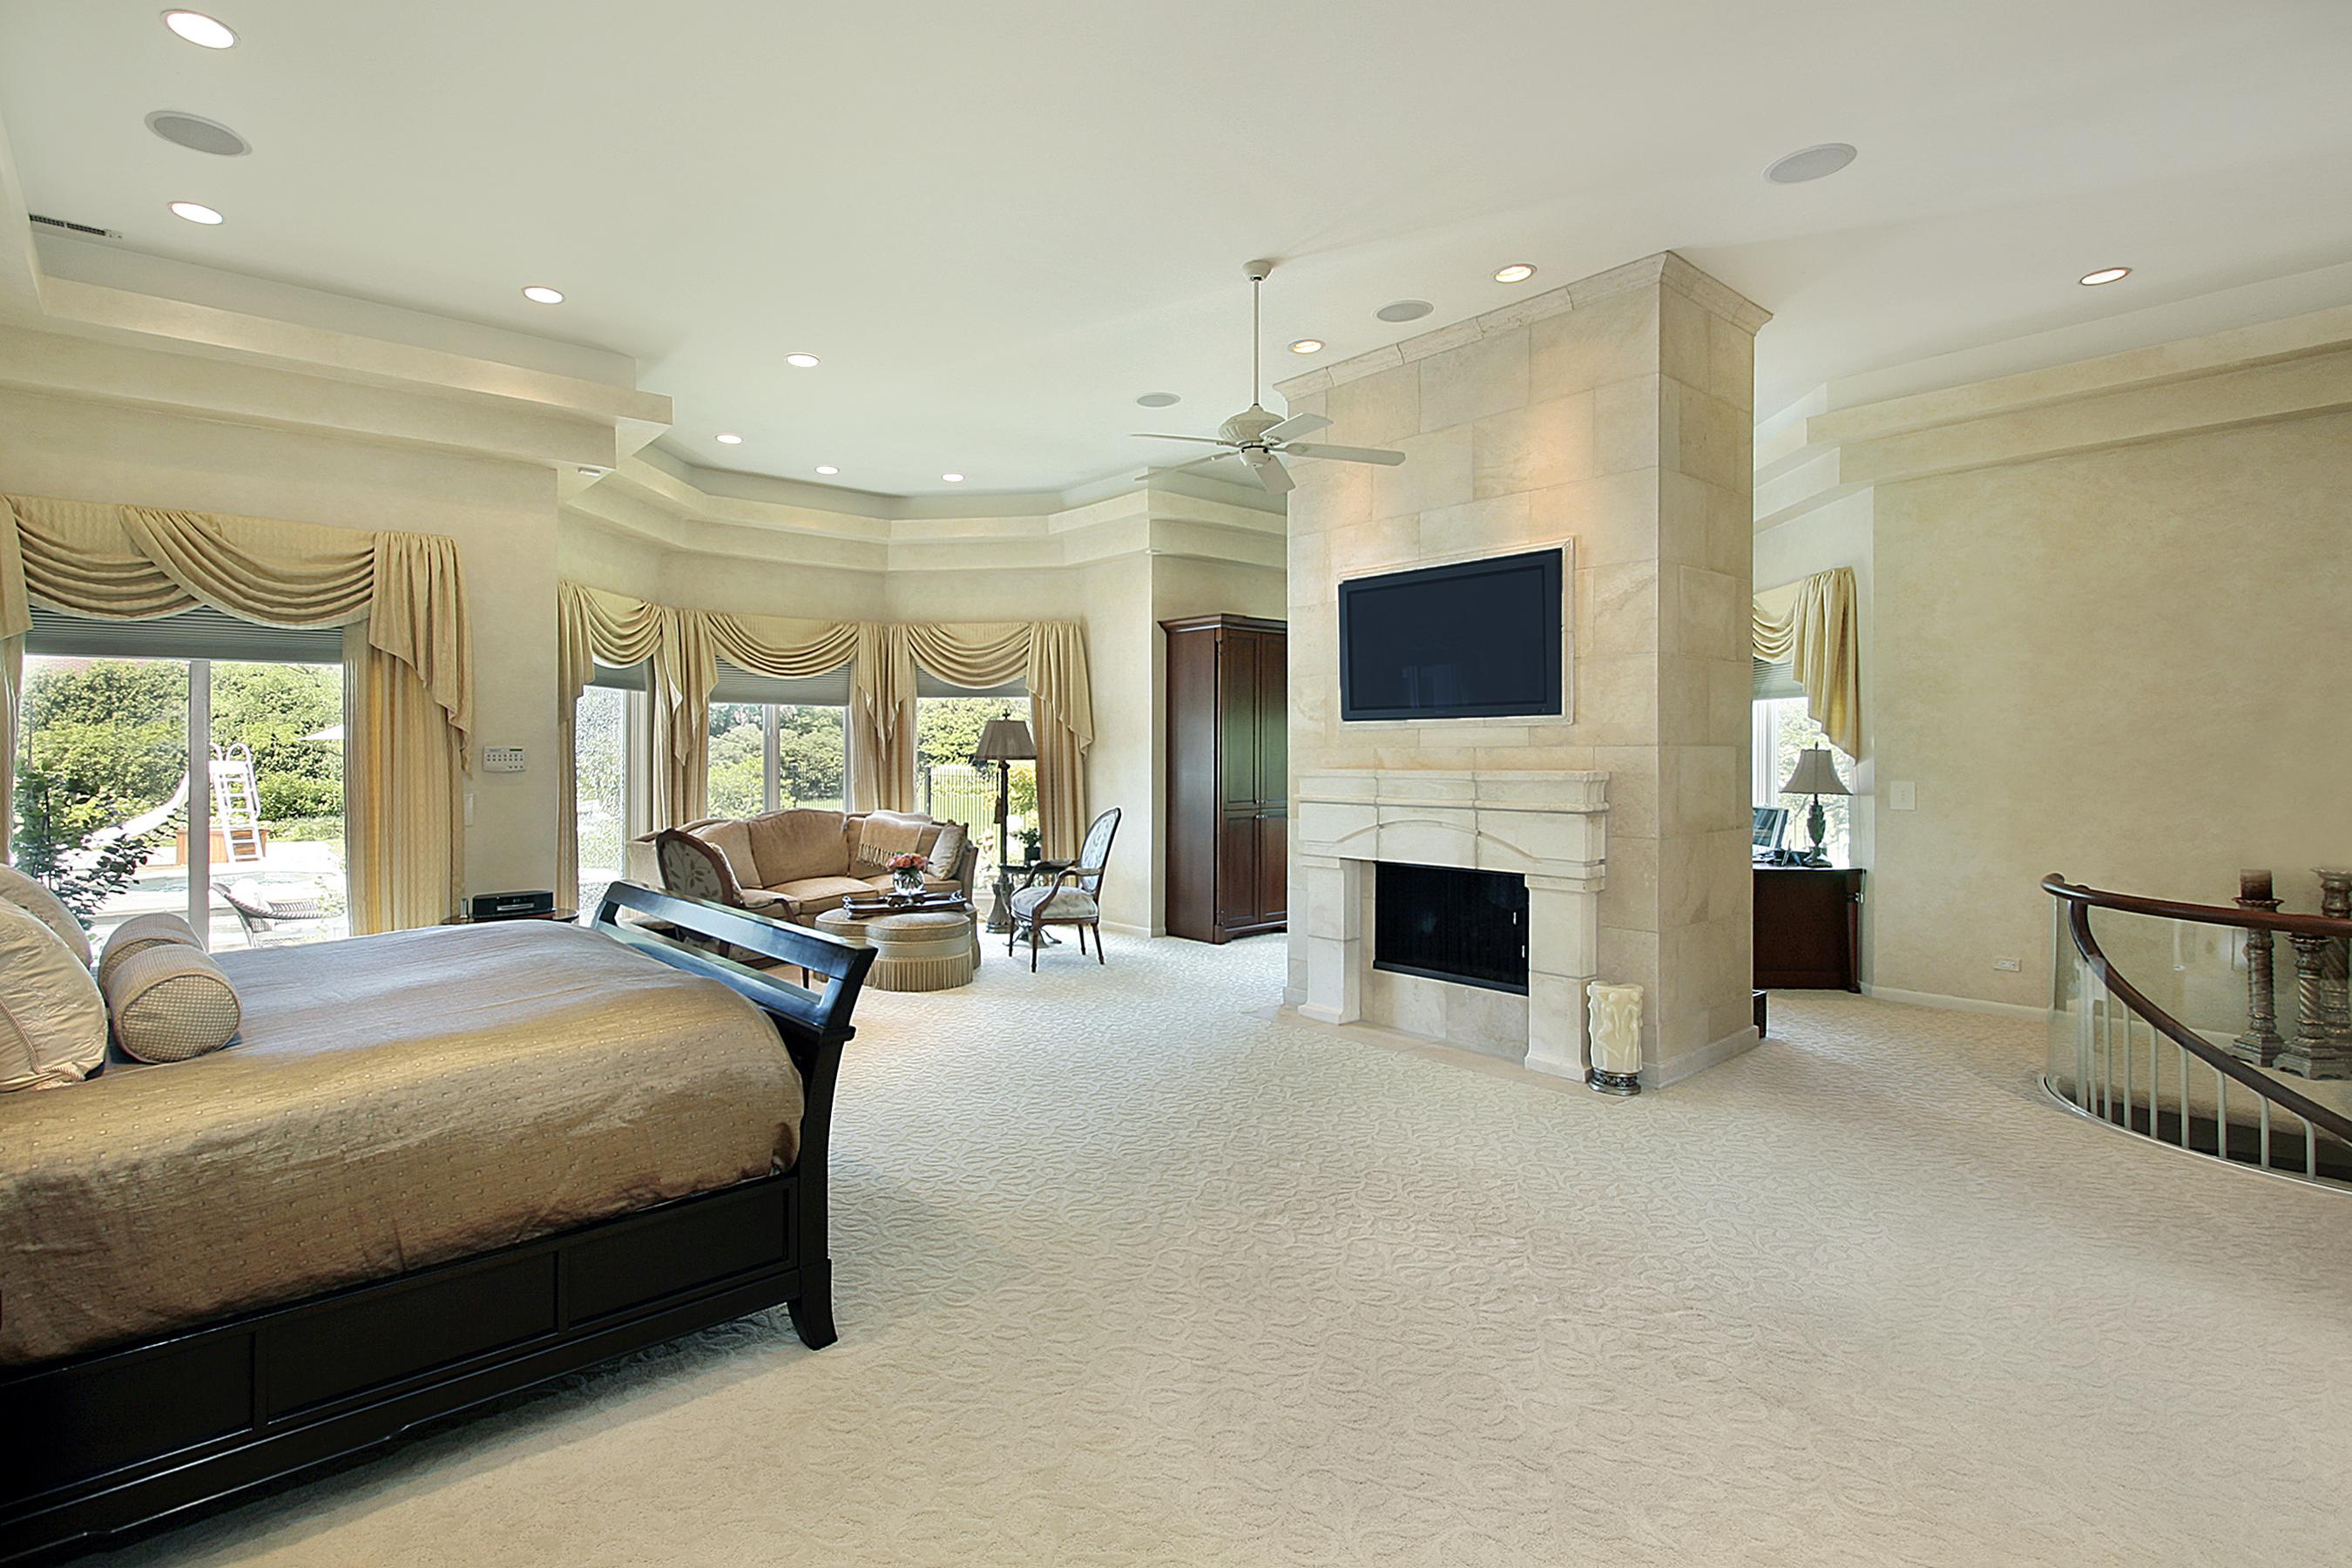 Fullsize Of Master Bedroom Remodel Ideas